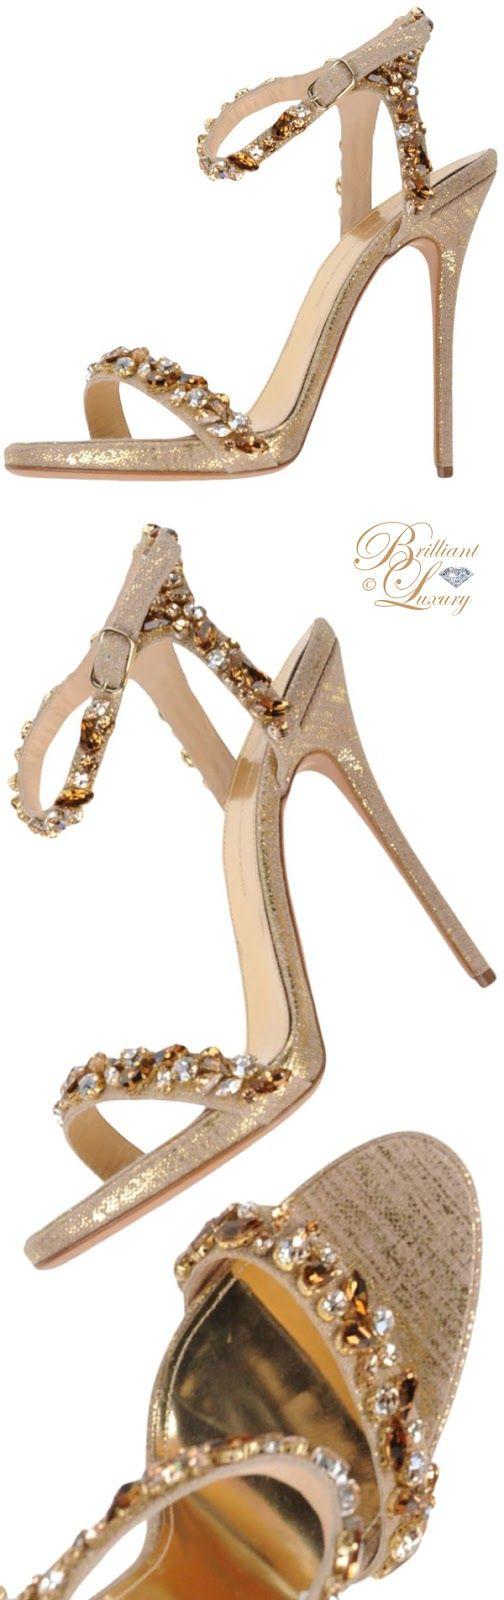 Brilliant Luxury ♦ Ermanno Scervino sandal